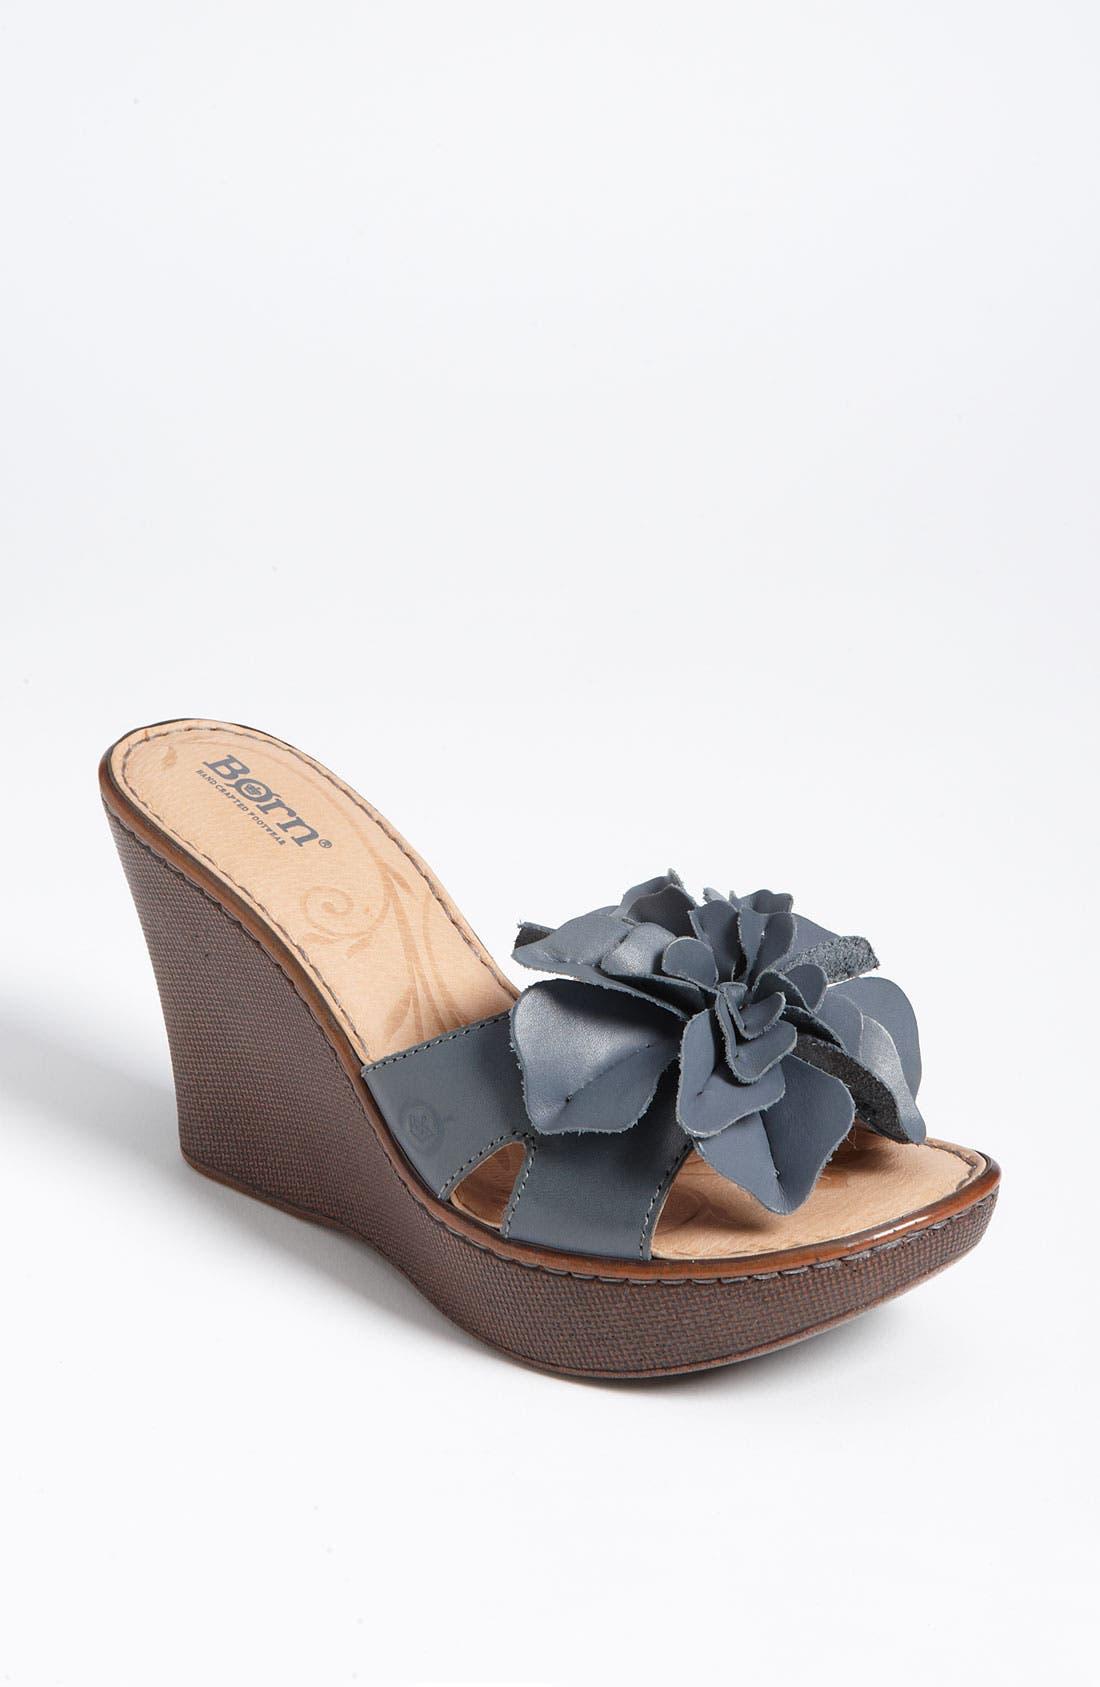 Alternate Image 1 Selected - Børn 'Avita' Sandal